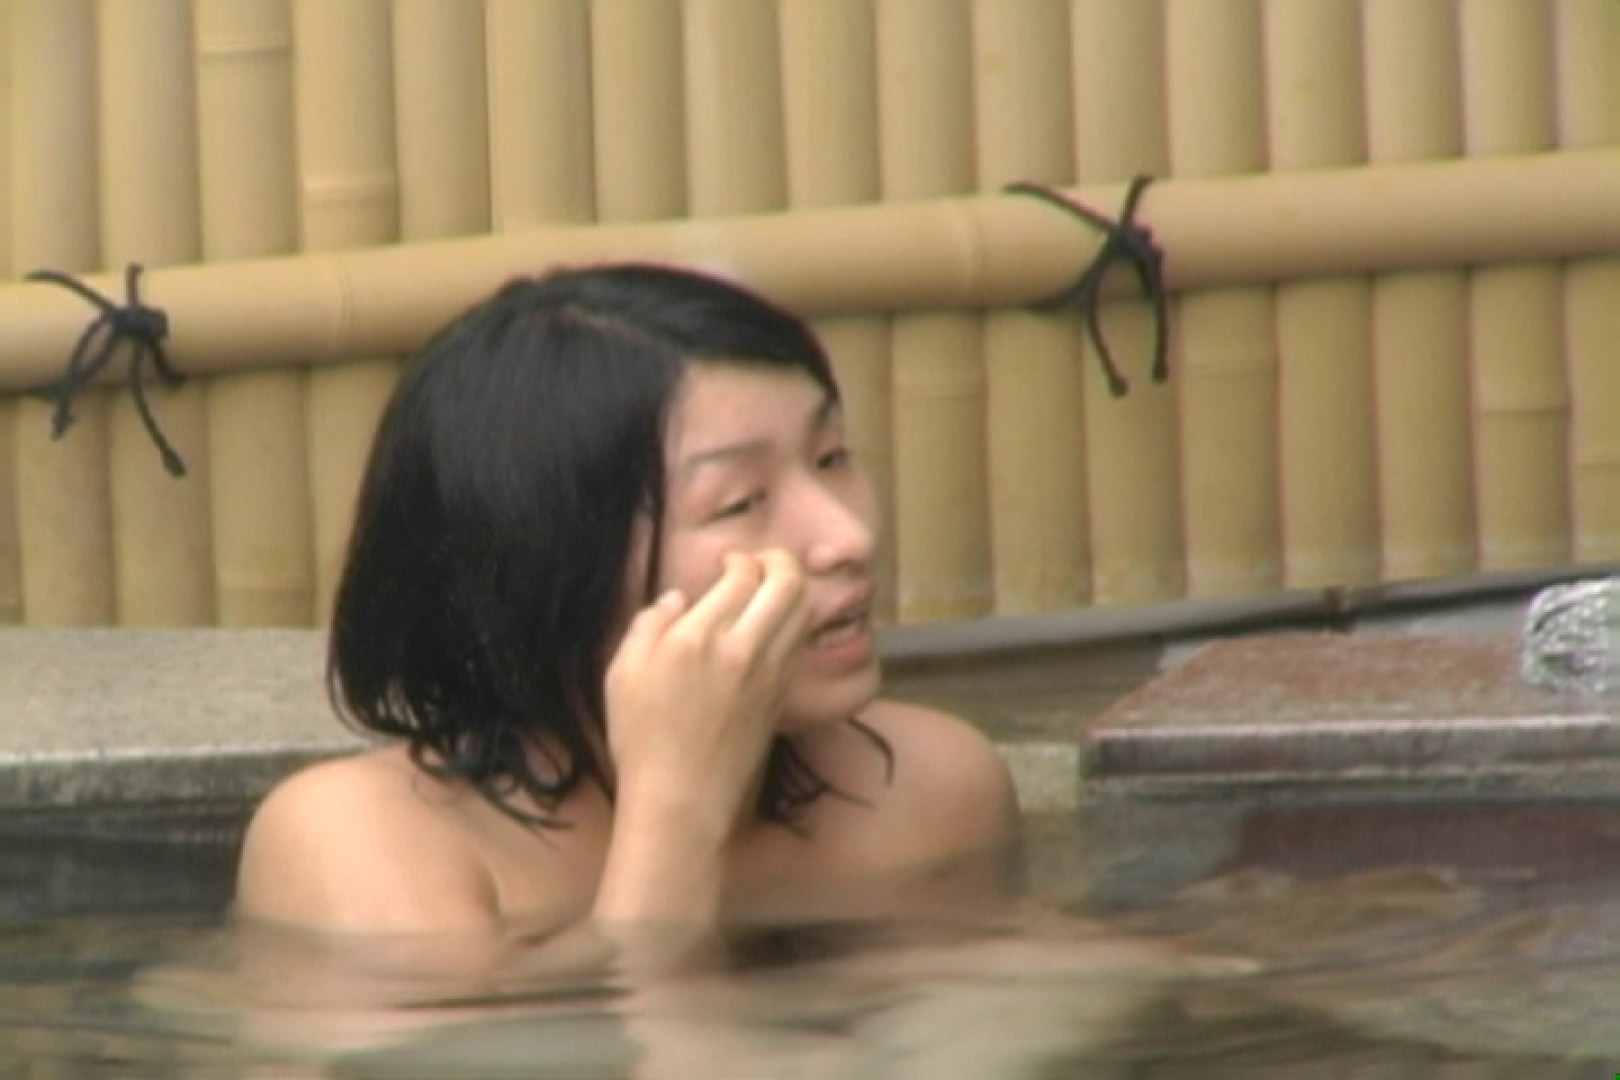 Aquaな露天風呂Vol.618 盗撮映像  104Pix 67